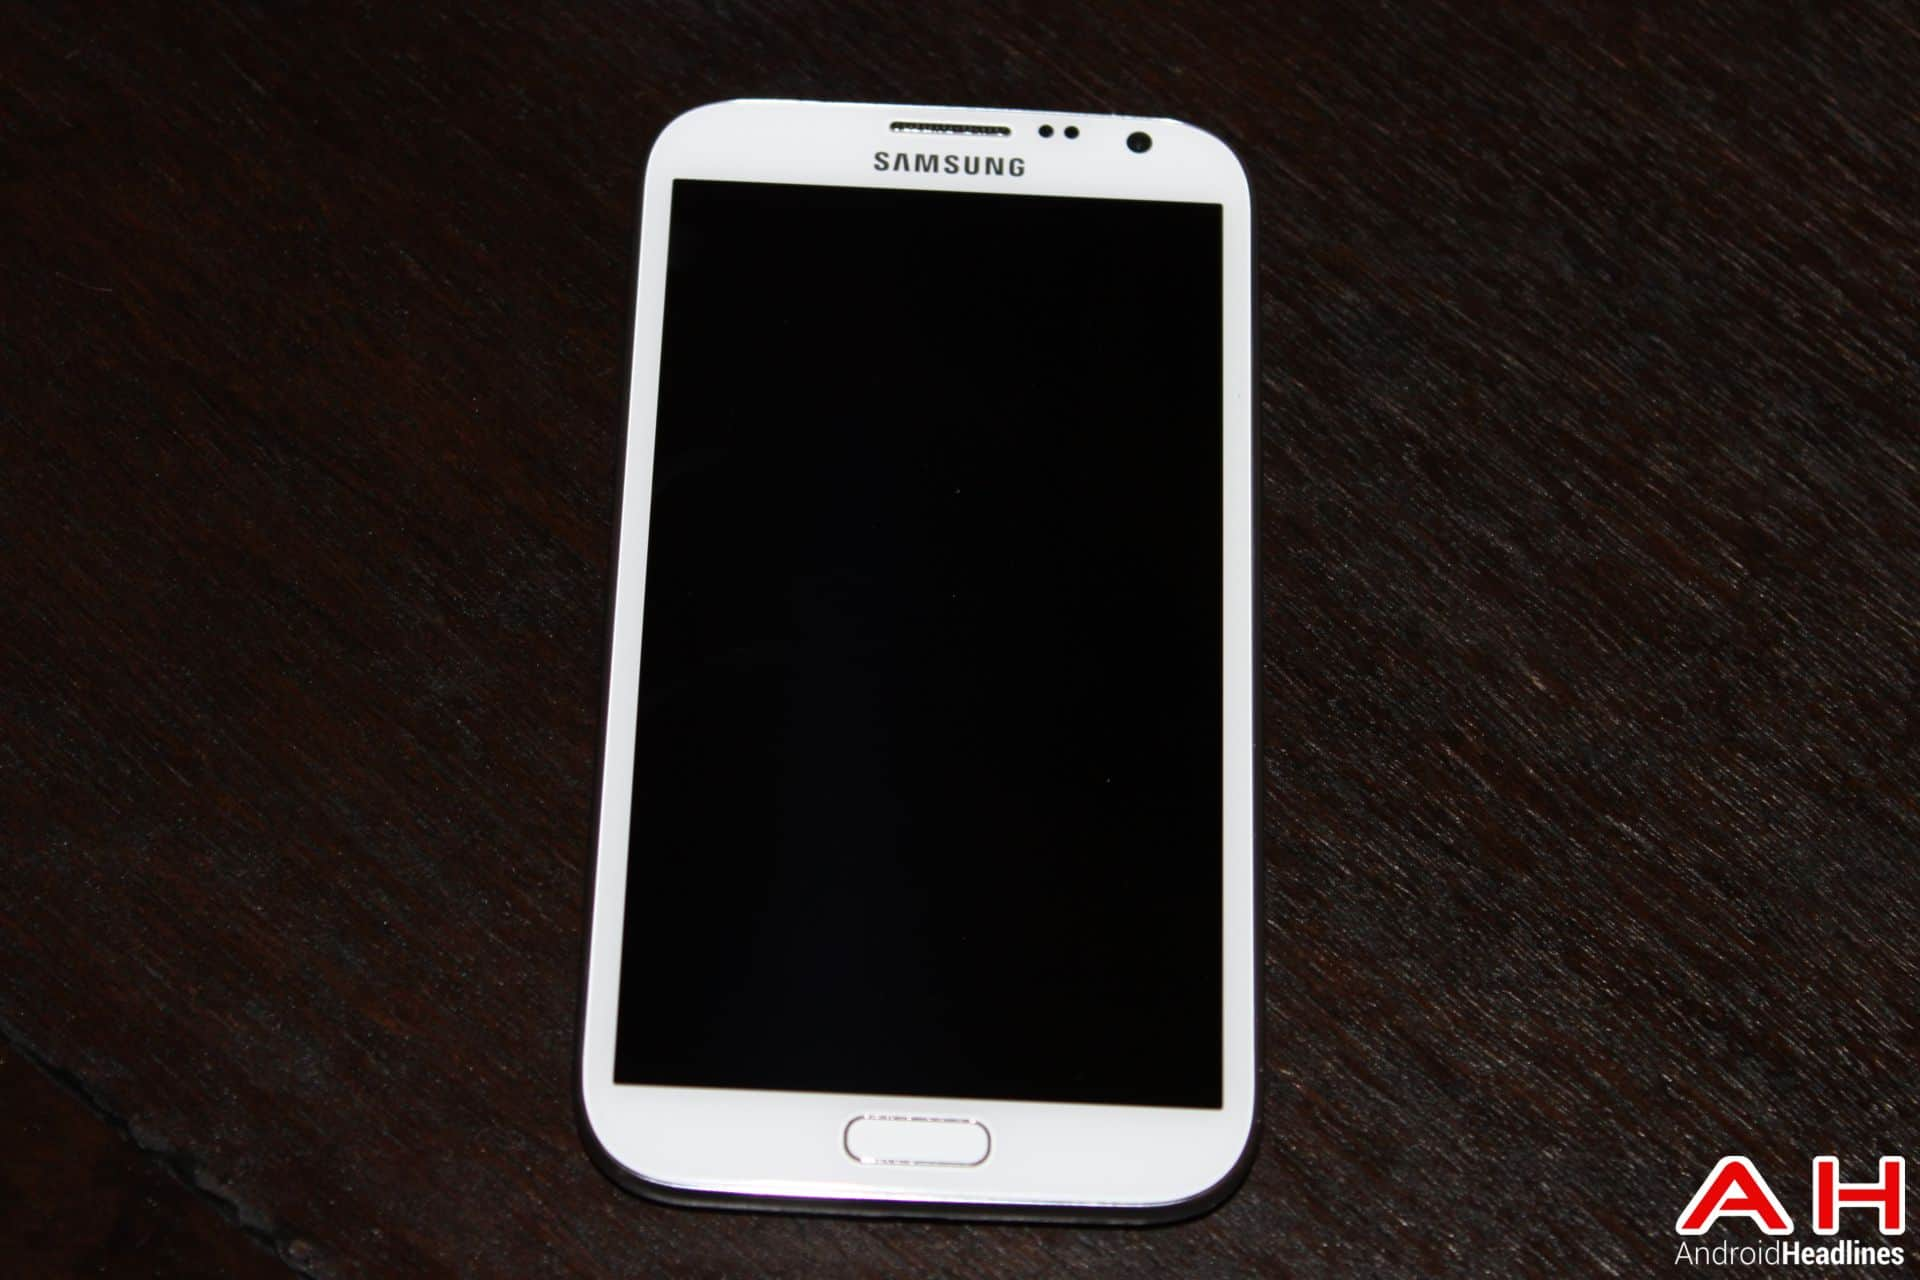 AH Samsung Galaxy S3 Logo 2.2